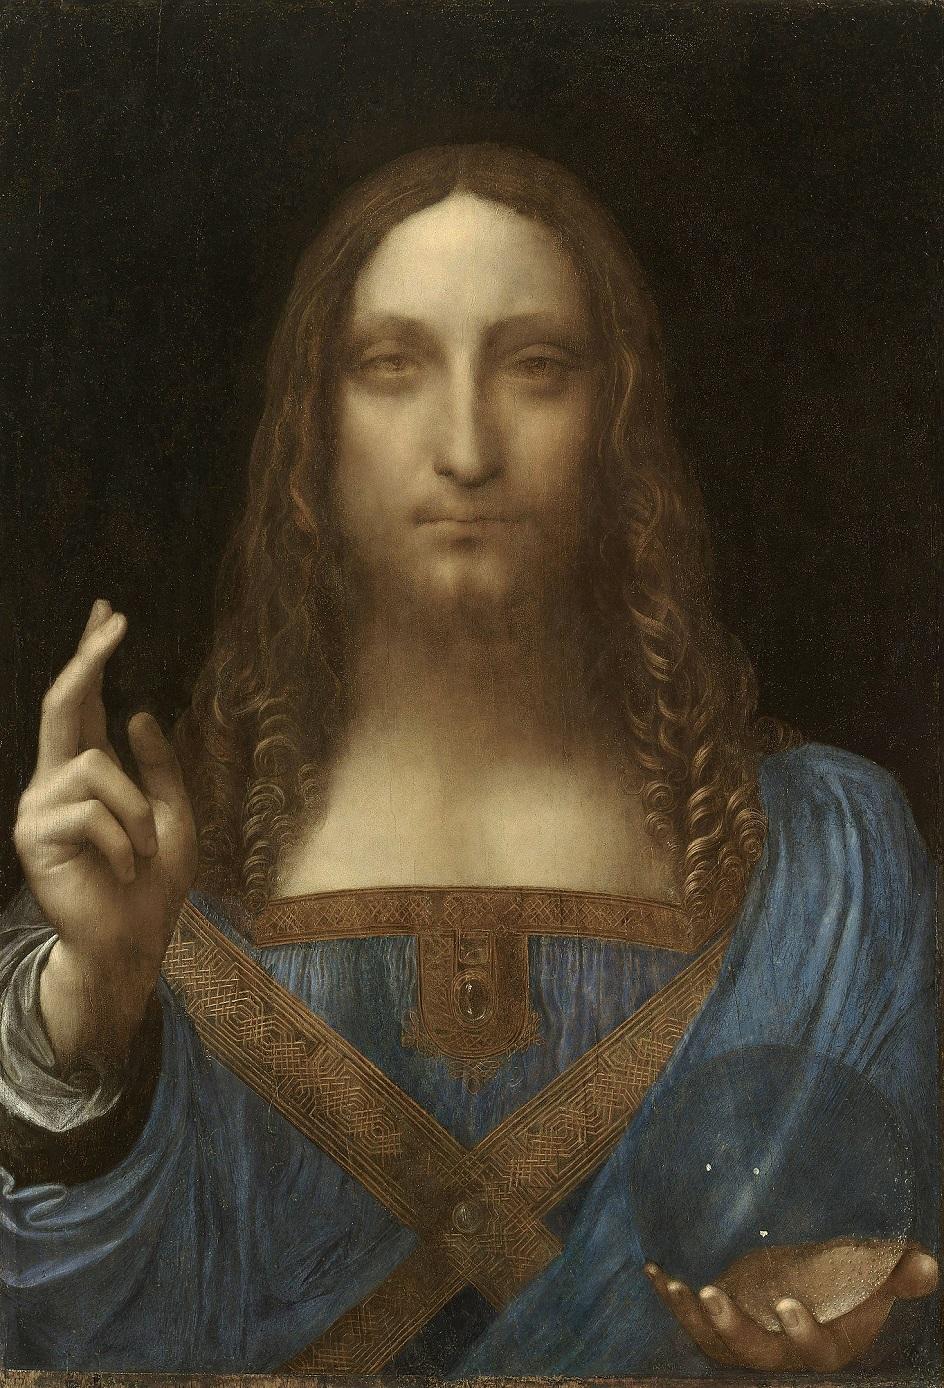 Леонардо да Винчи. Картина «Спаситель мира», 1499